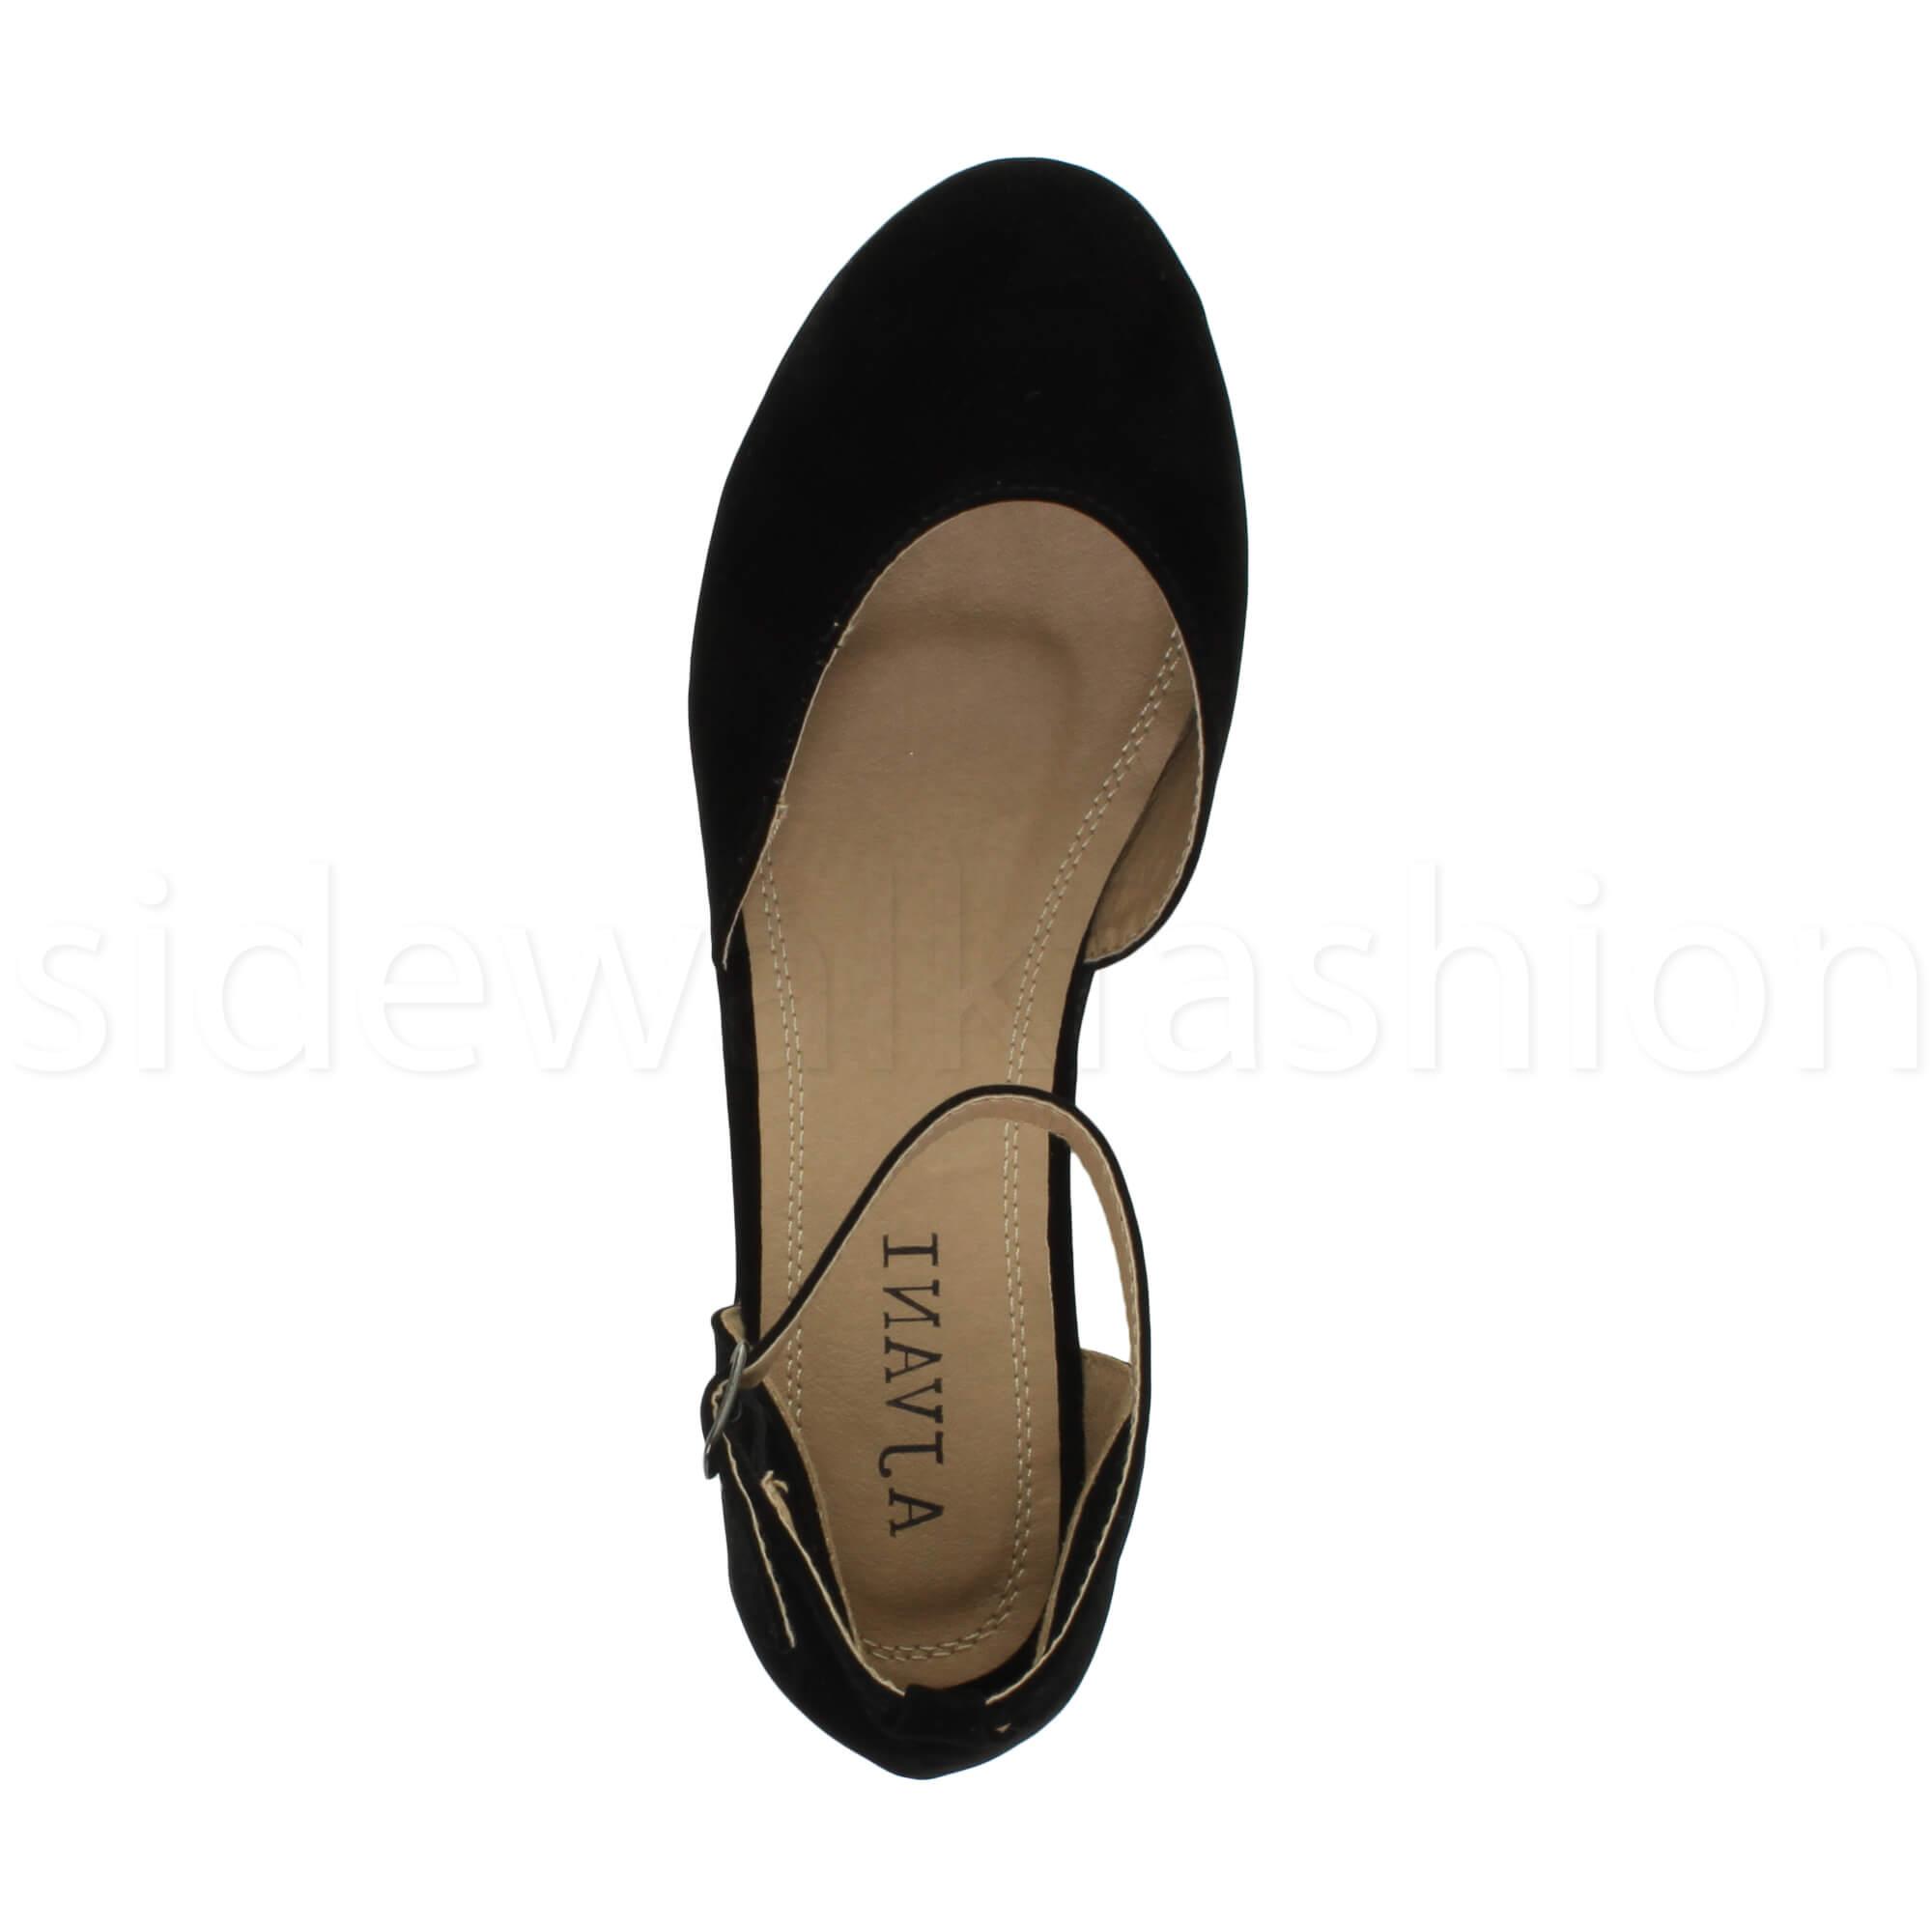 Womens-ladies-flatform-mid-wedge-ankle-strap-platform-court-shoes-sandals-size thumbnail 16